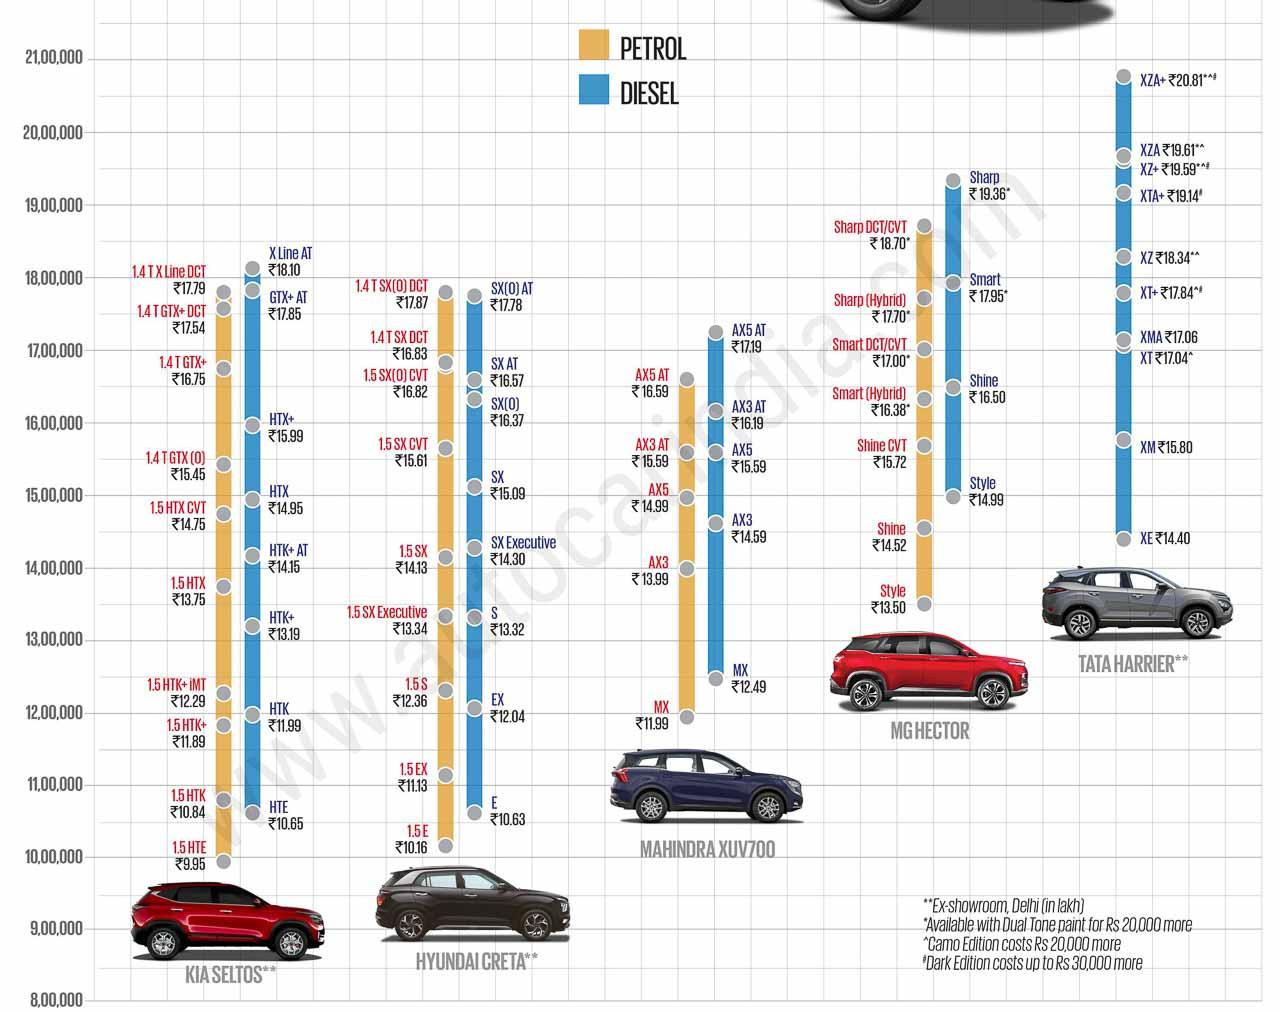 Mahindra XUV700 Vs Rivals - Price Comparison